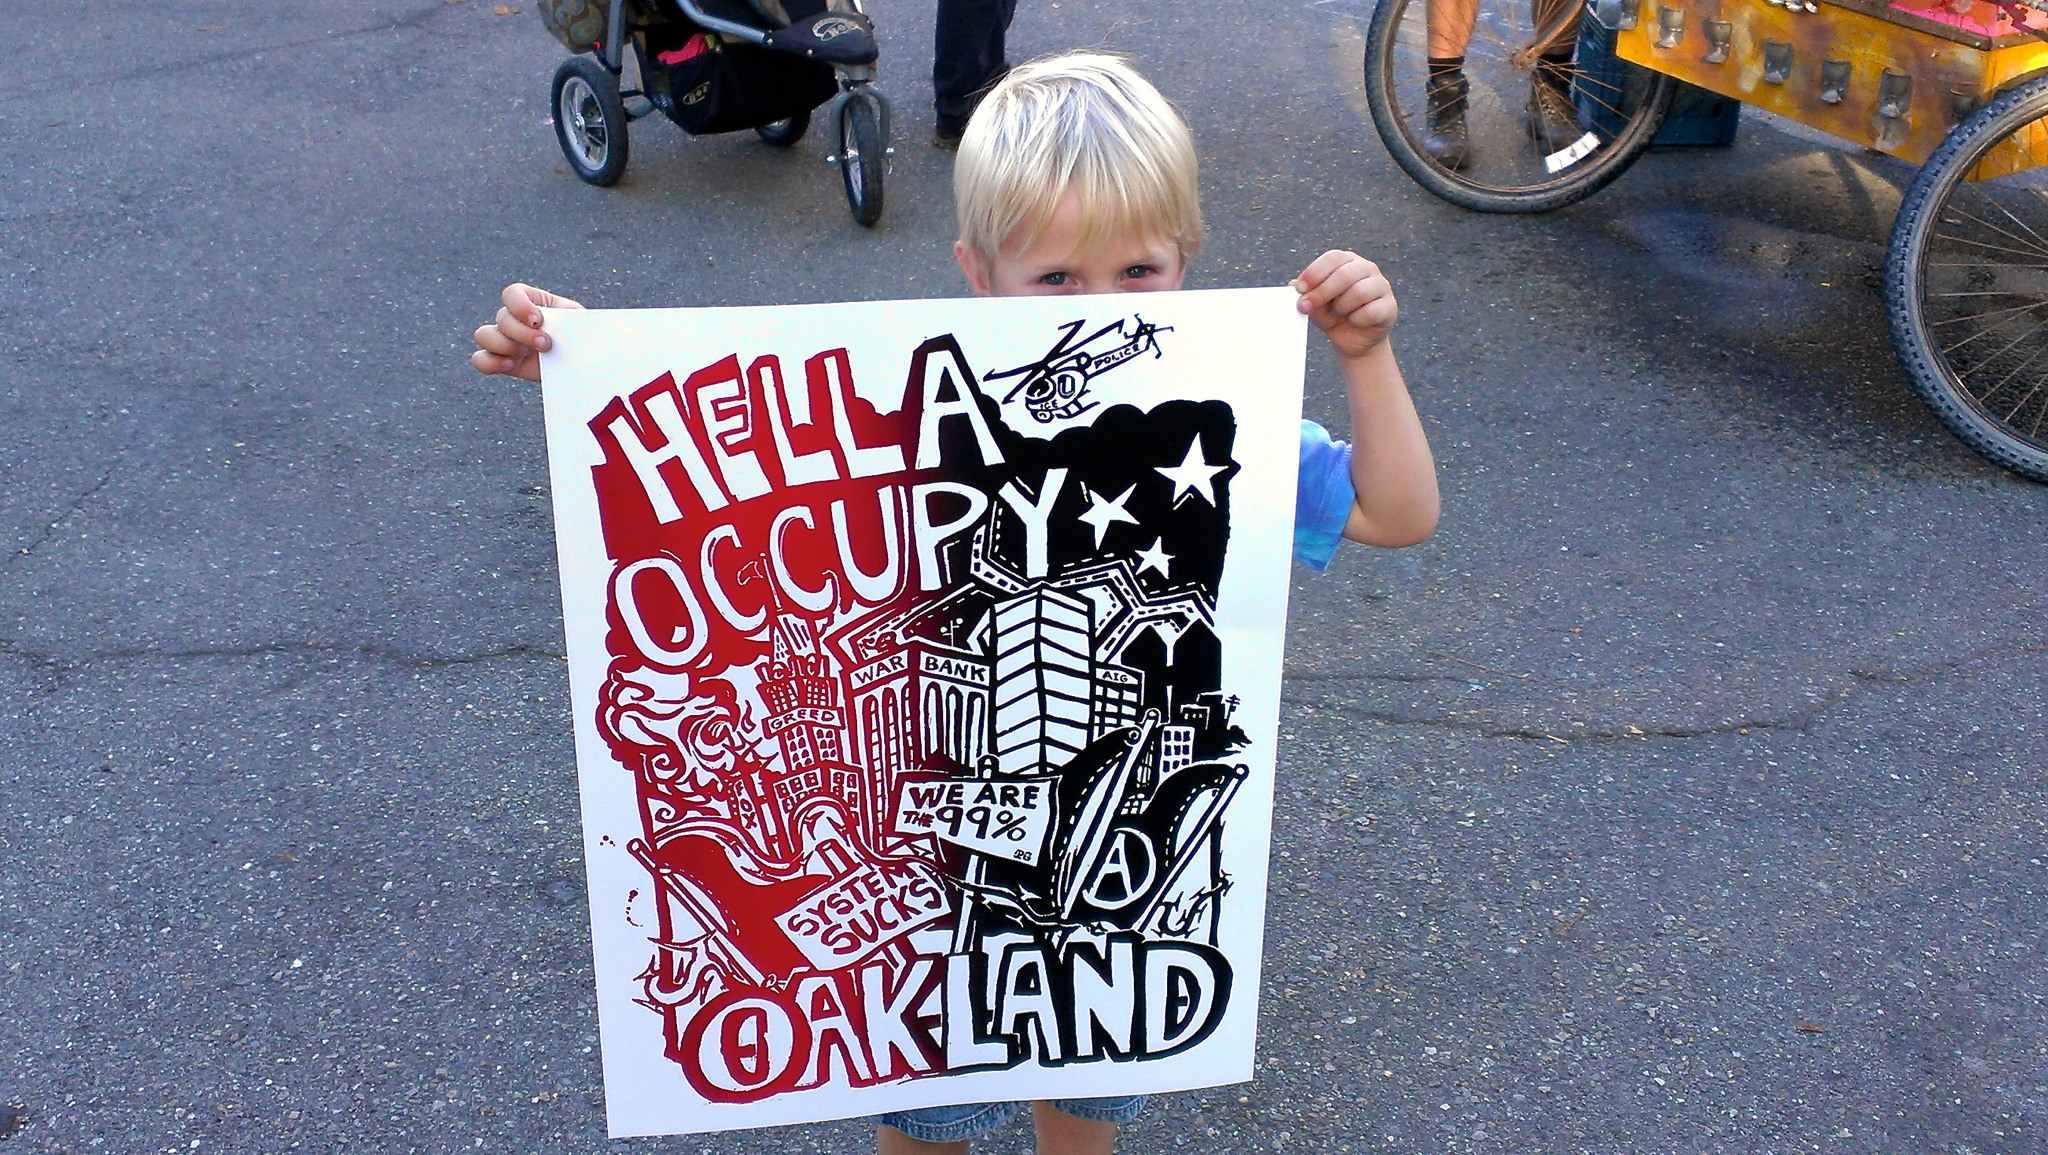 Hella in use in the Bay Area © Zach Copley/flickr